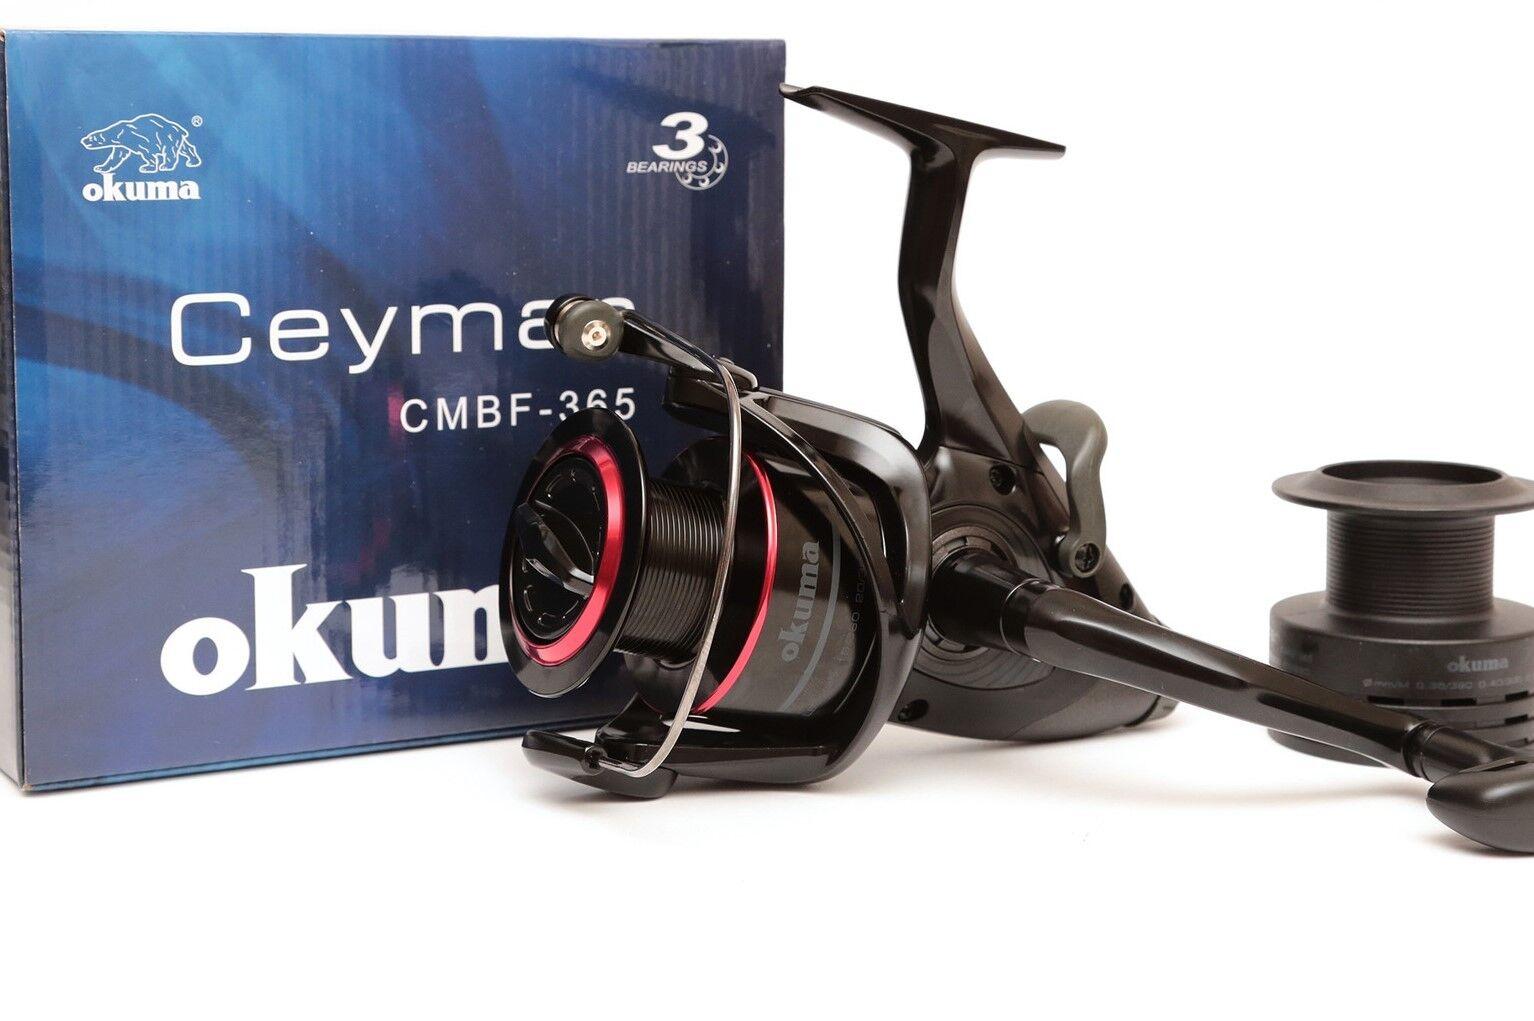 Okuma CEYMAR CMBF-355 Baitfeeder Carp   Sea Reel -  With Spare Spool - 54204  the cheapest